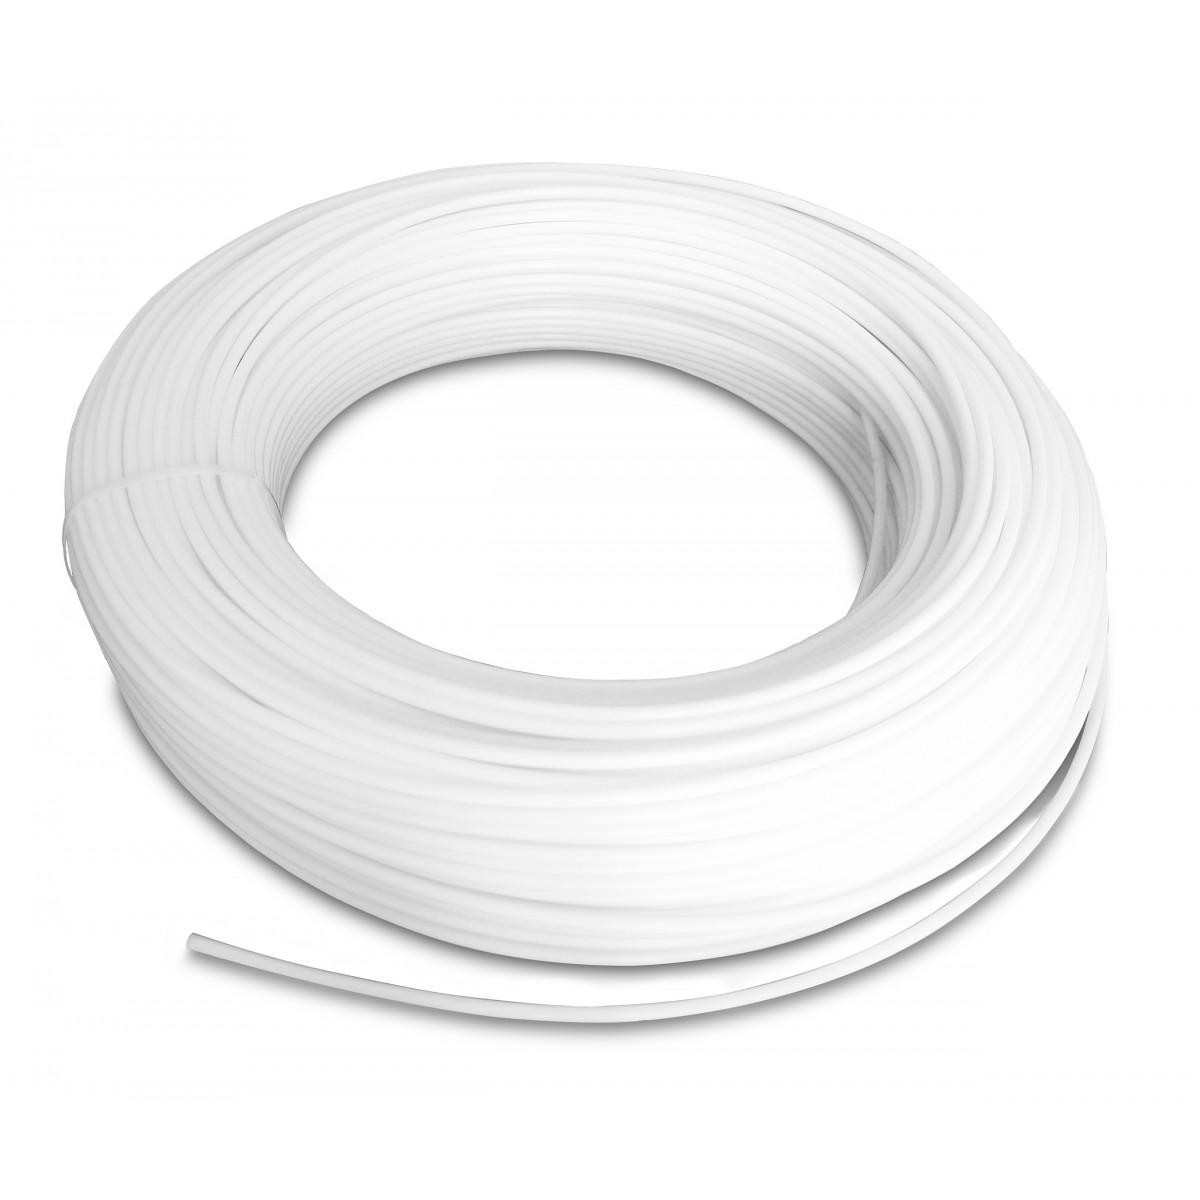 7ef605e6a5247d Przewód wąż poliamid PA Tekalan 4/2,5 mm 1mb transp. WASHSERVICE